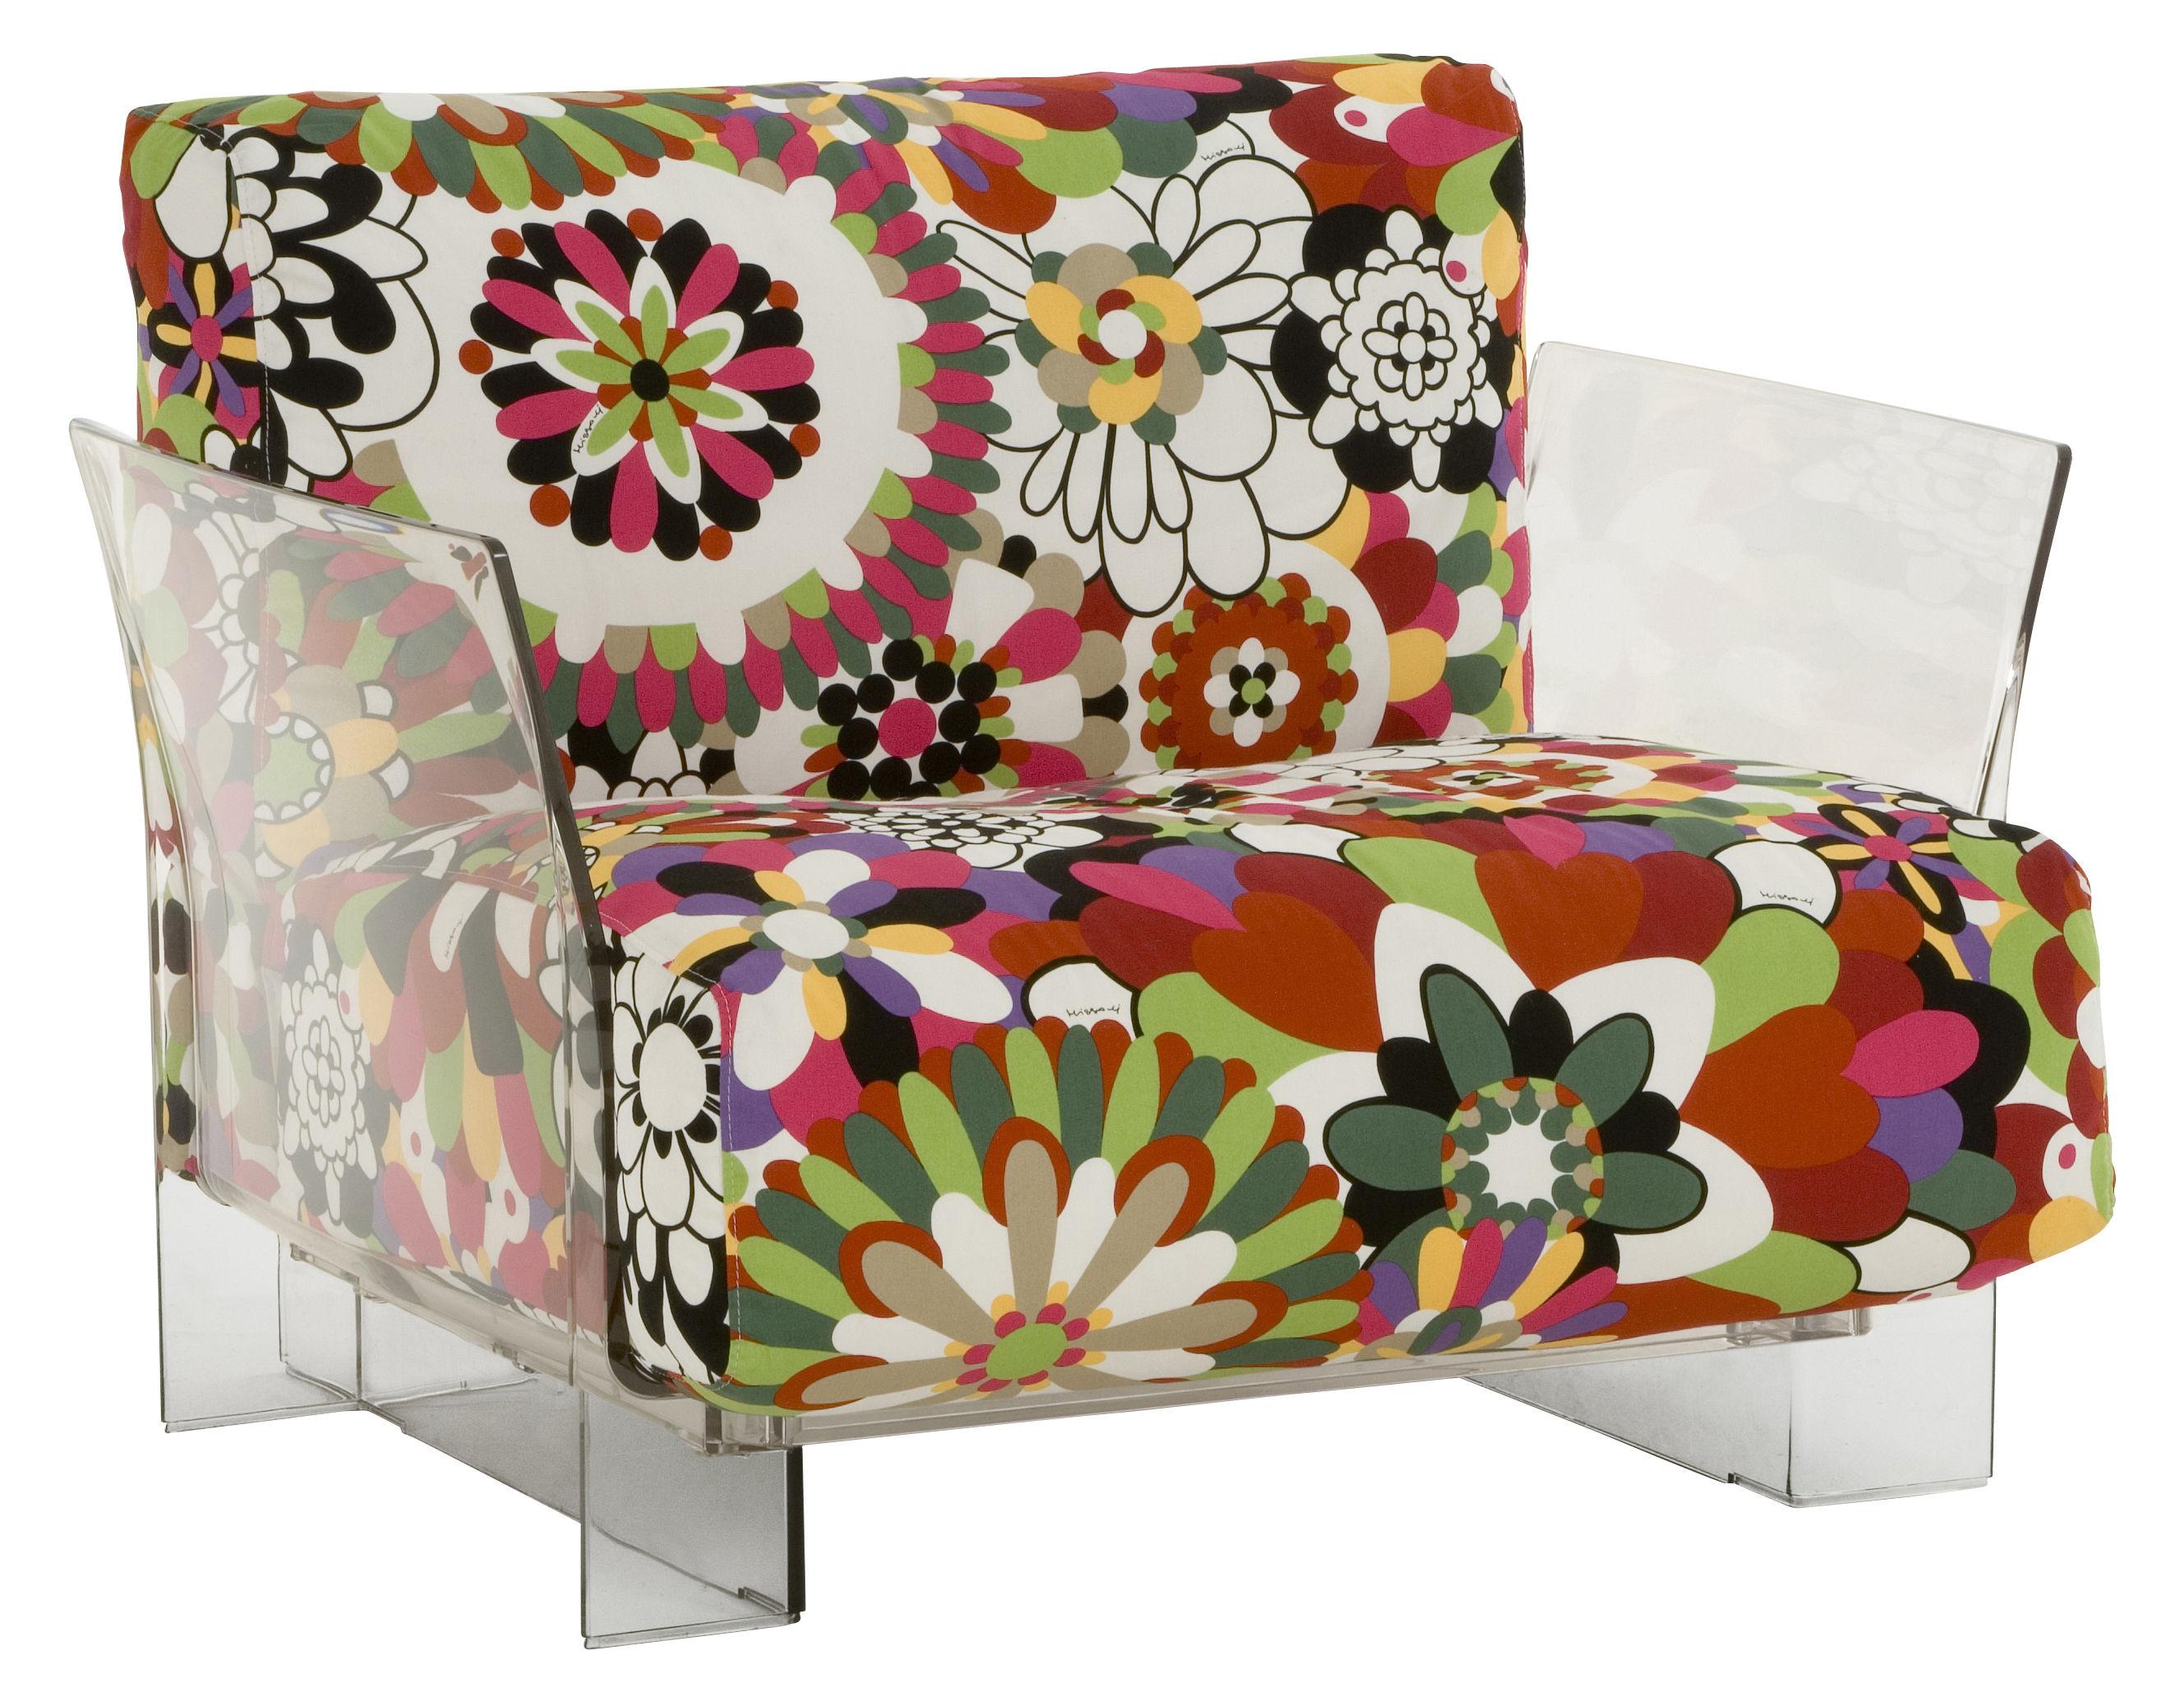 Möbel - Lounge Sessel - Pop Missoni Gepolsterter Sessel - Kartell - Blumen in Rottönen - Baumwolle, Polykarbonat